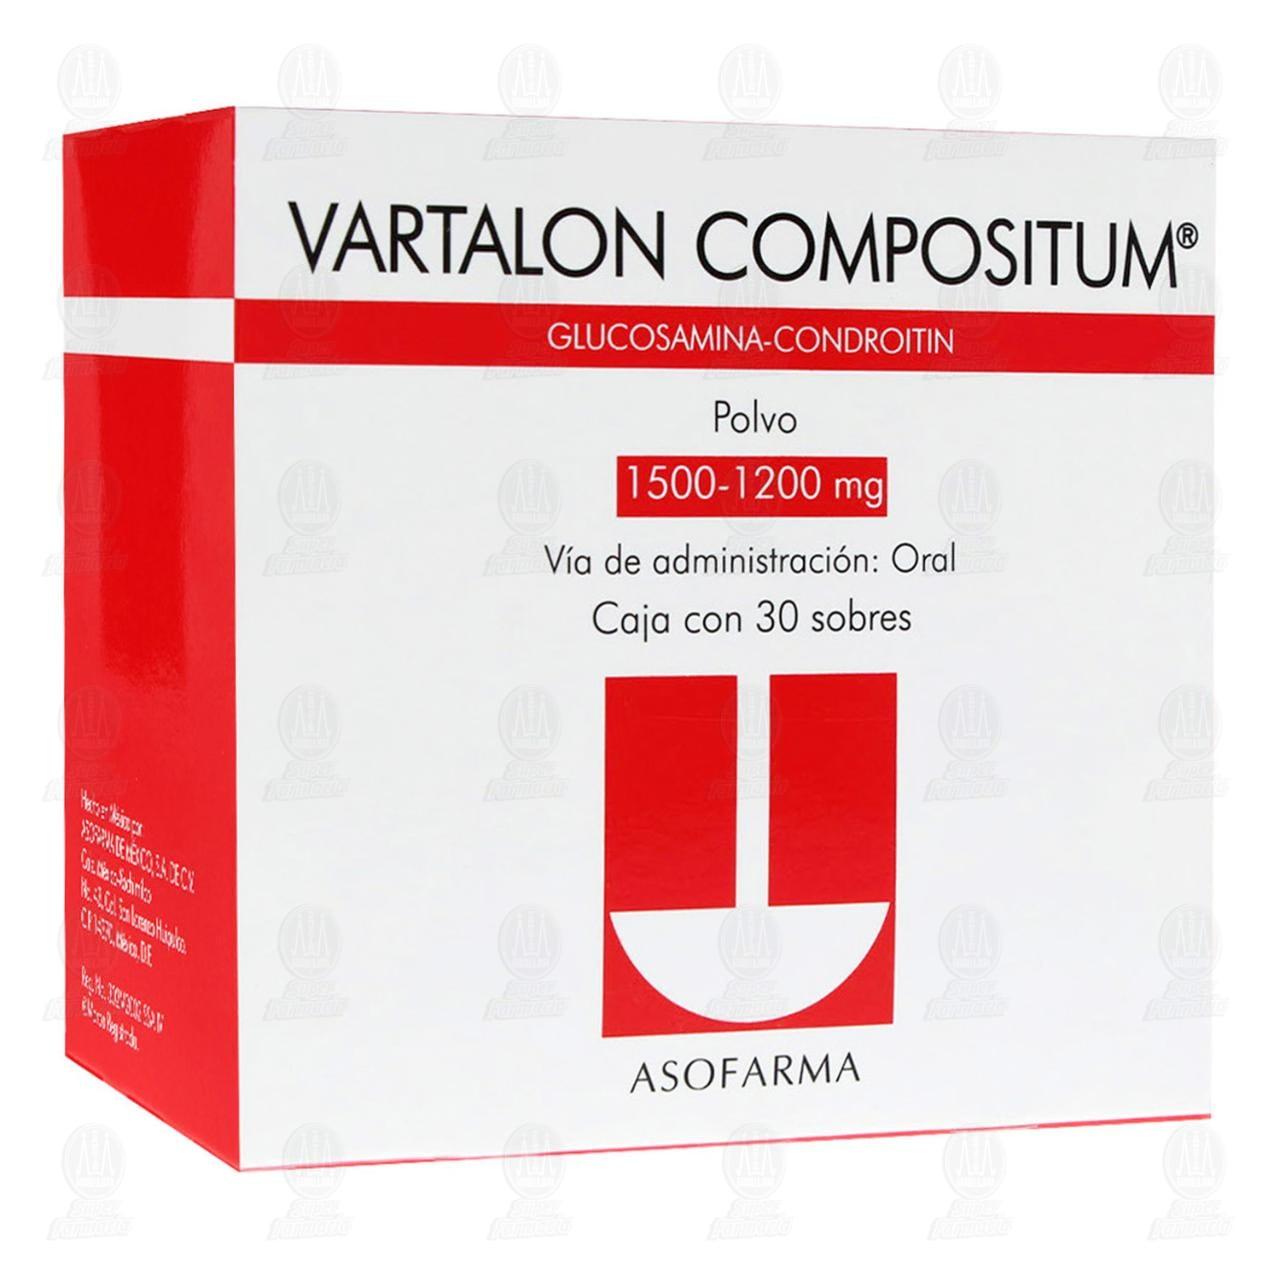 Vartalon Compositum 1500mg/1200mg 30 Sobres